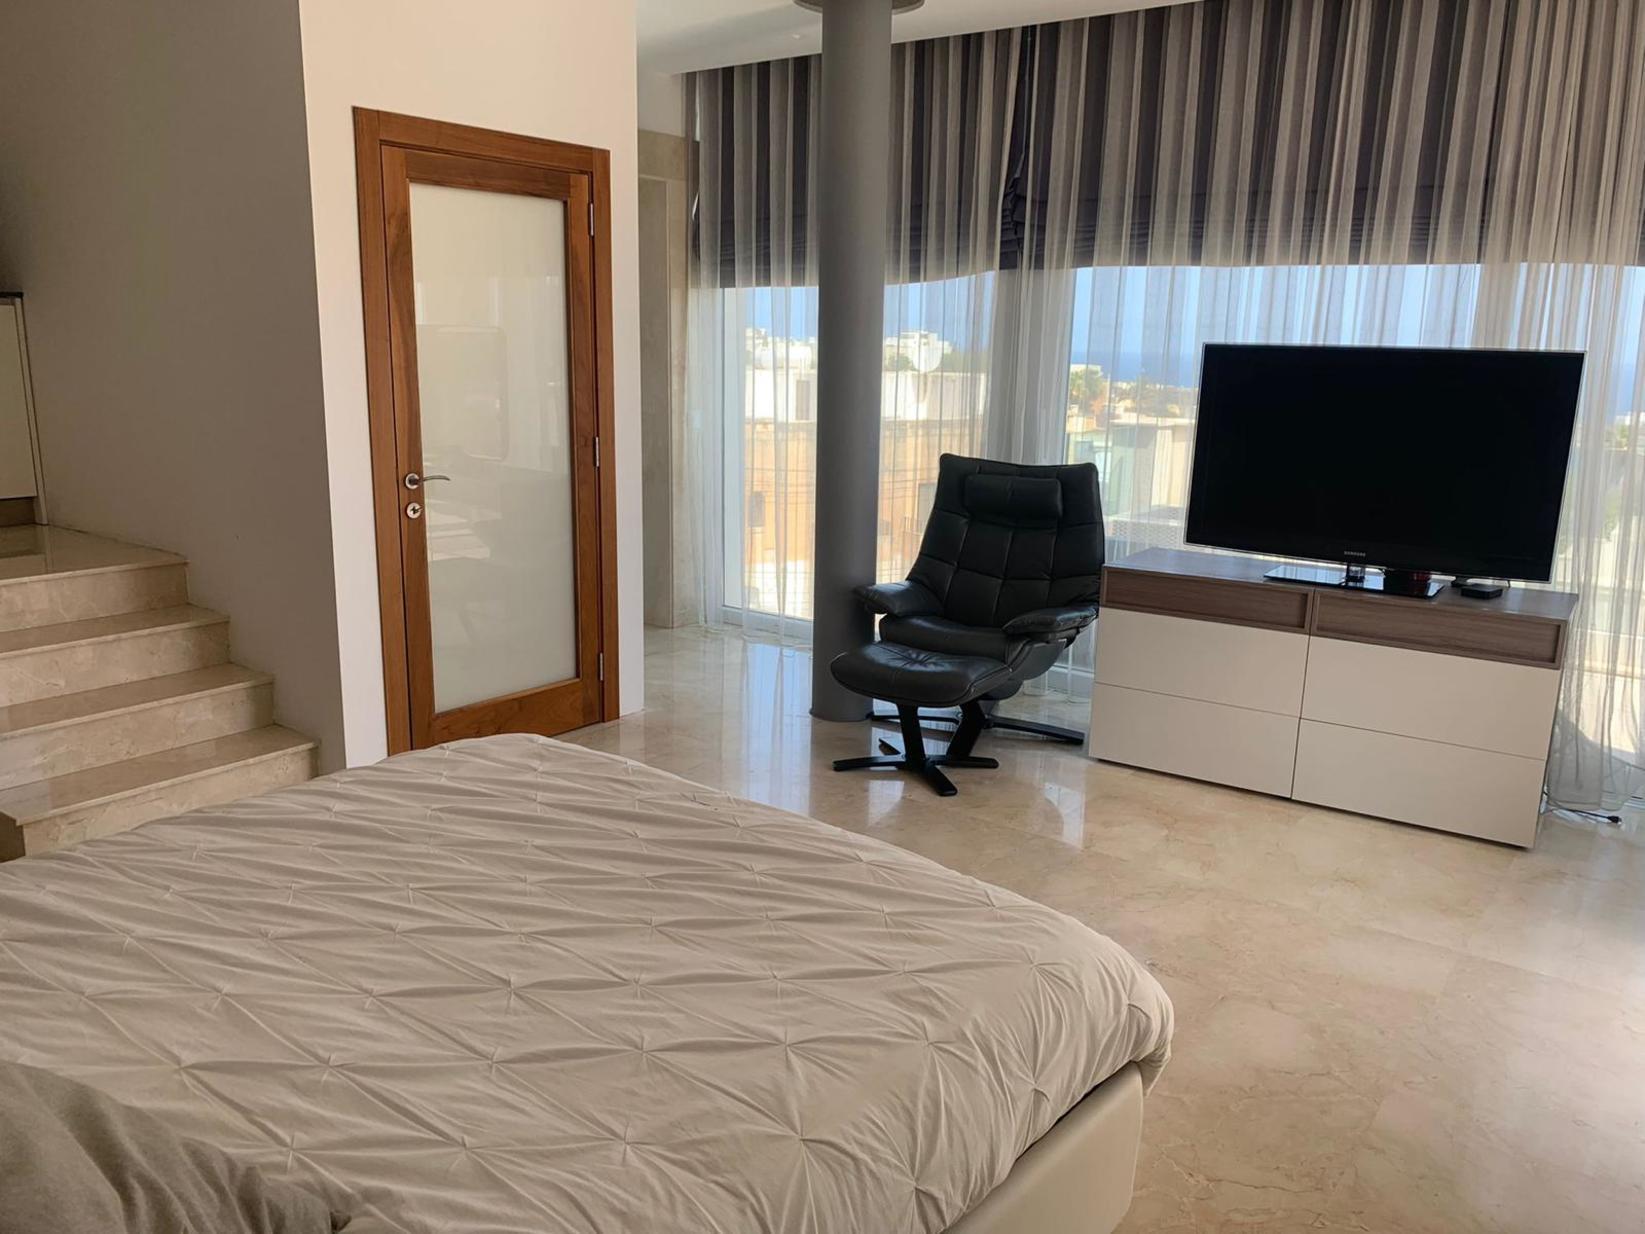 4 bed Villa For Rent in Ibragg, Ibragg - thumb 10